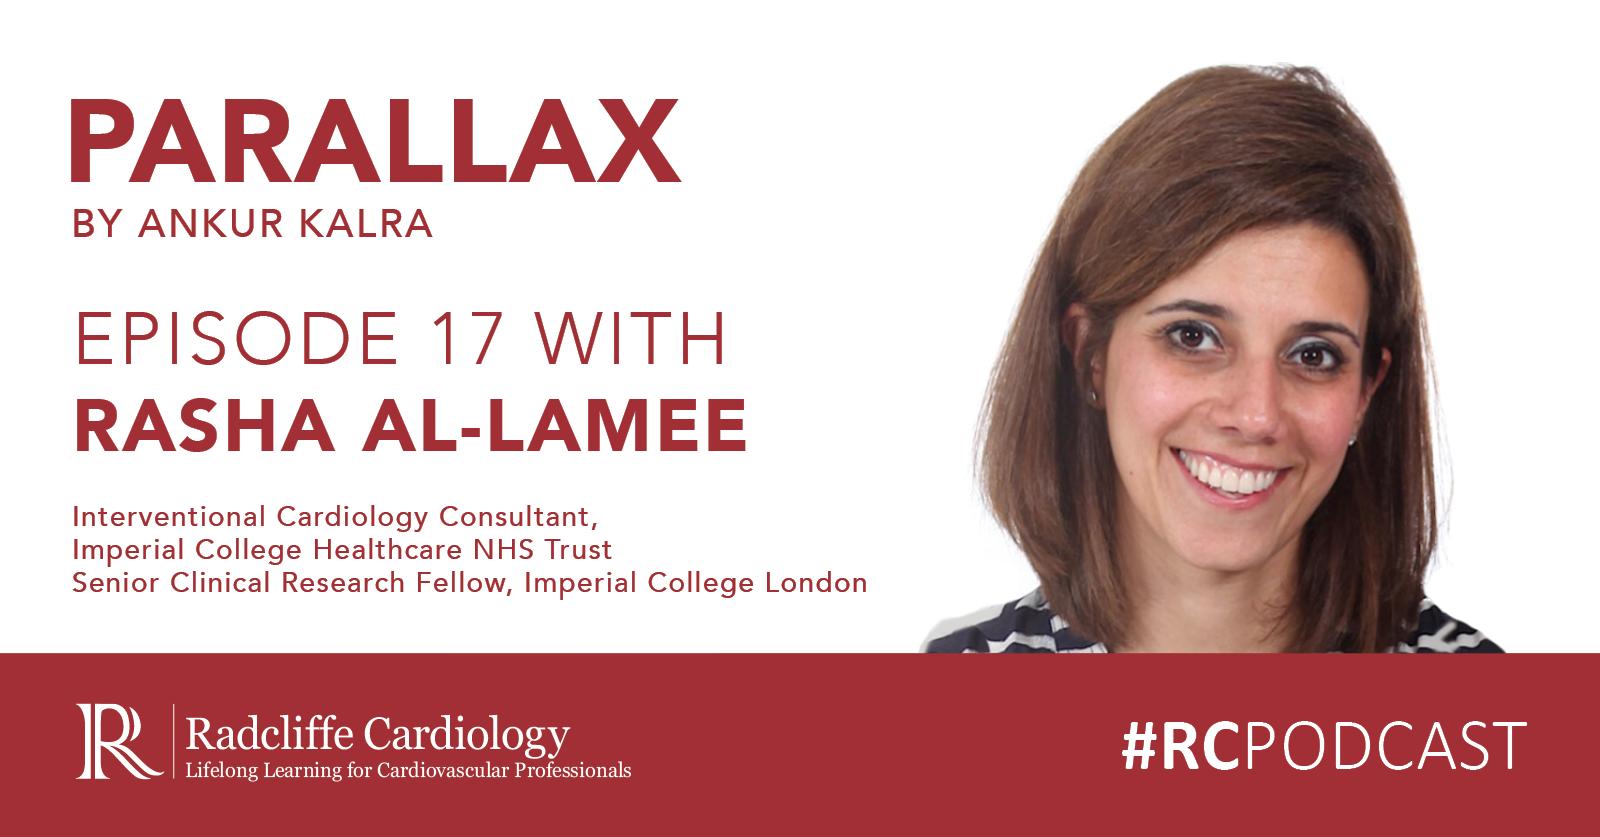 Rasha Al-Lamee On ORBITA, ISCHEMIA, Coronary Revascularisation